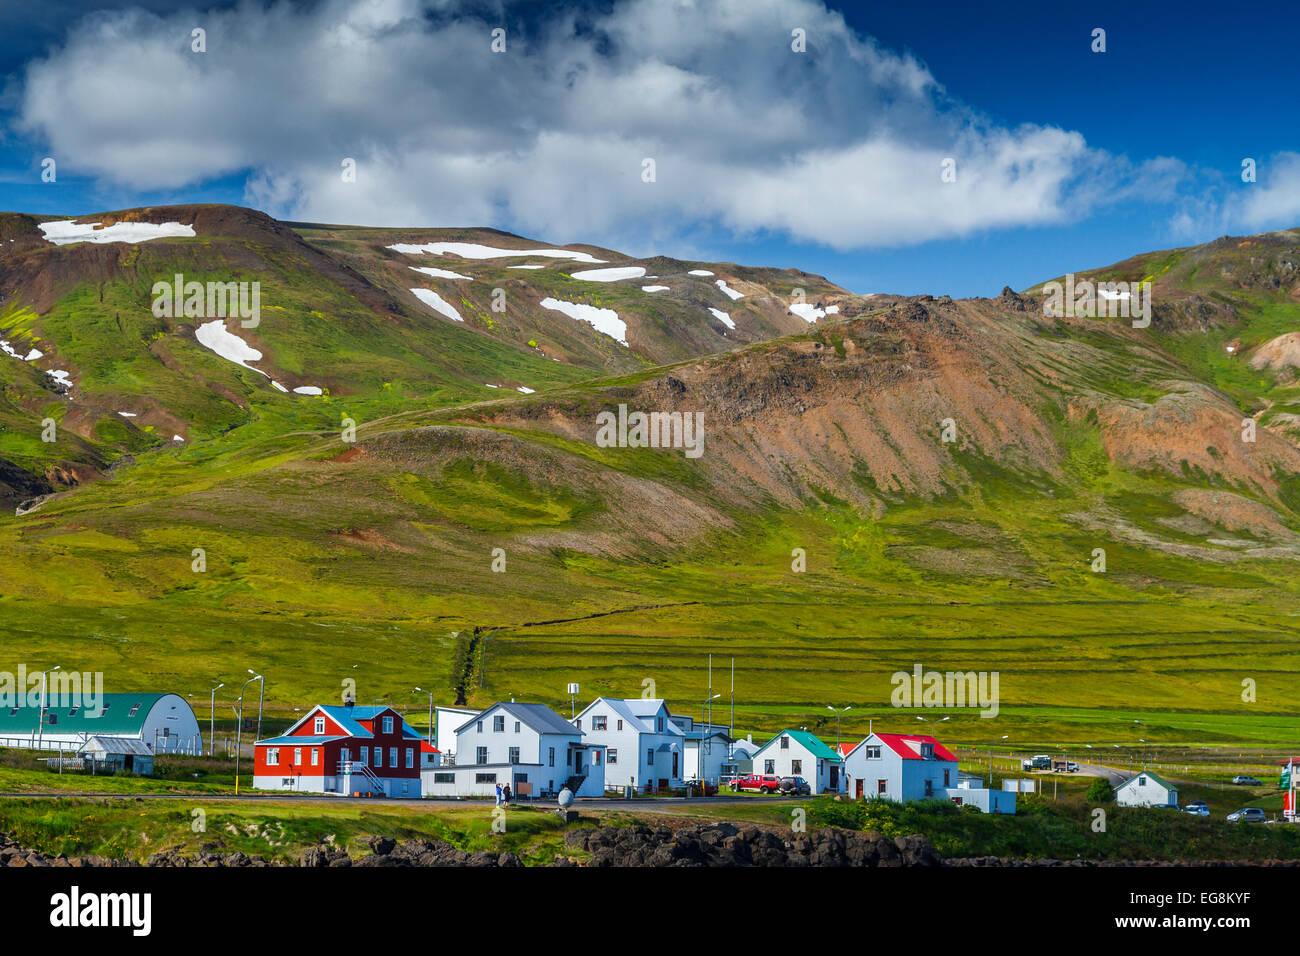 Bakkagerdi village. Borgarfjordur Eystri Fjord. East Fjords. Iceland, Europe - Stock Image